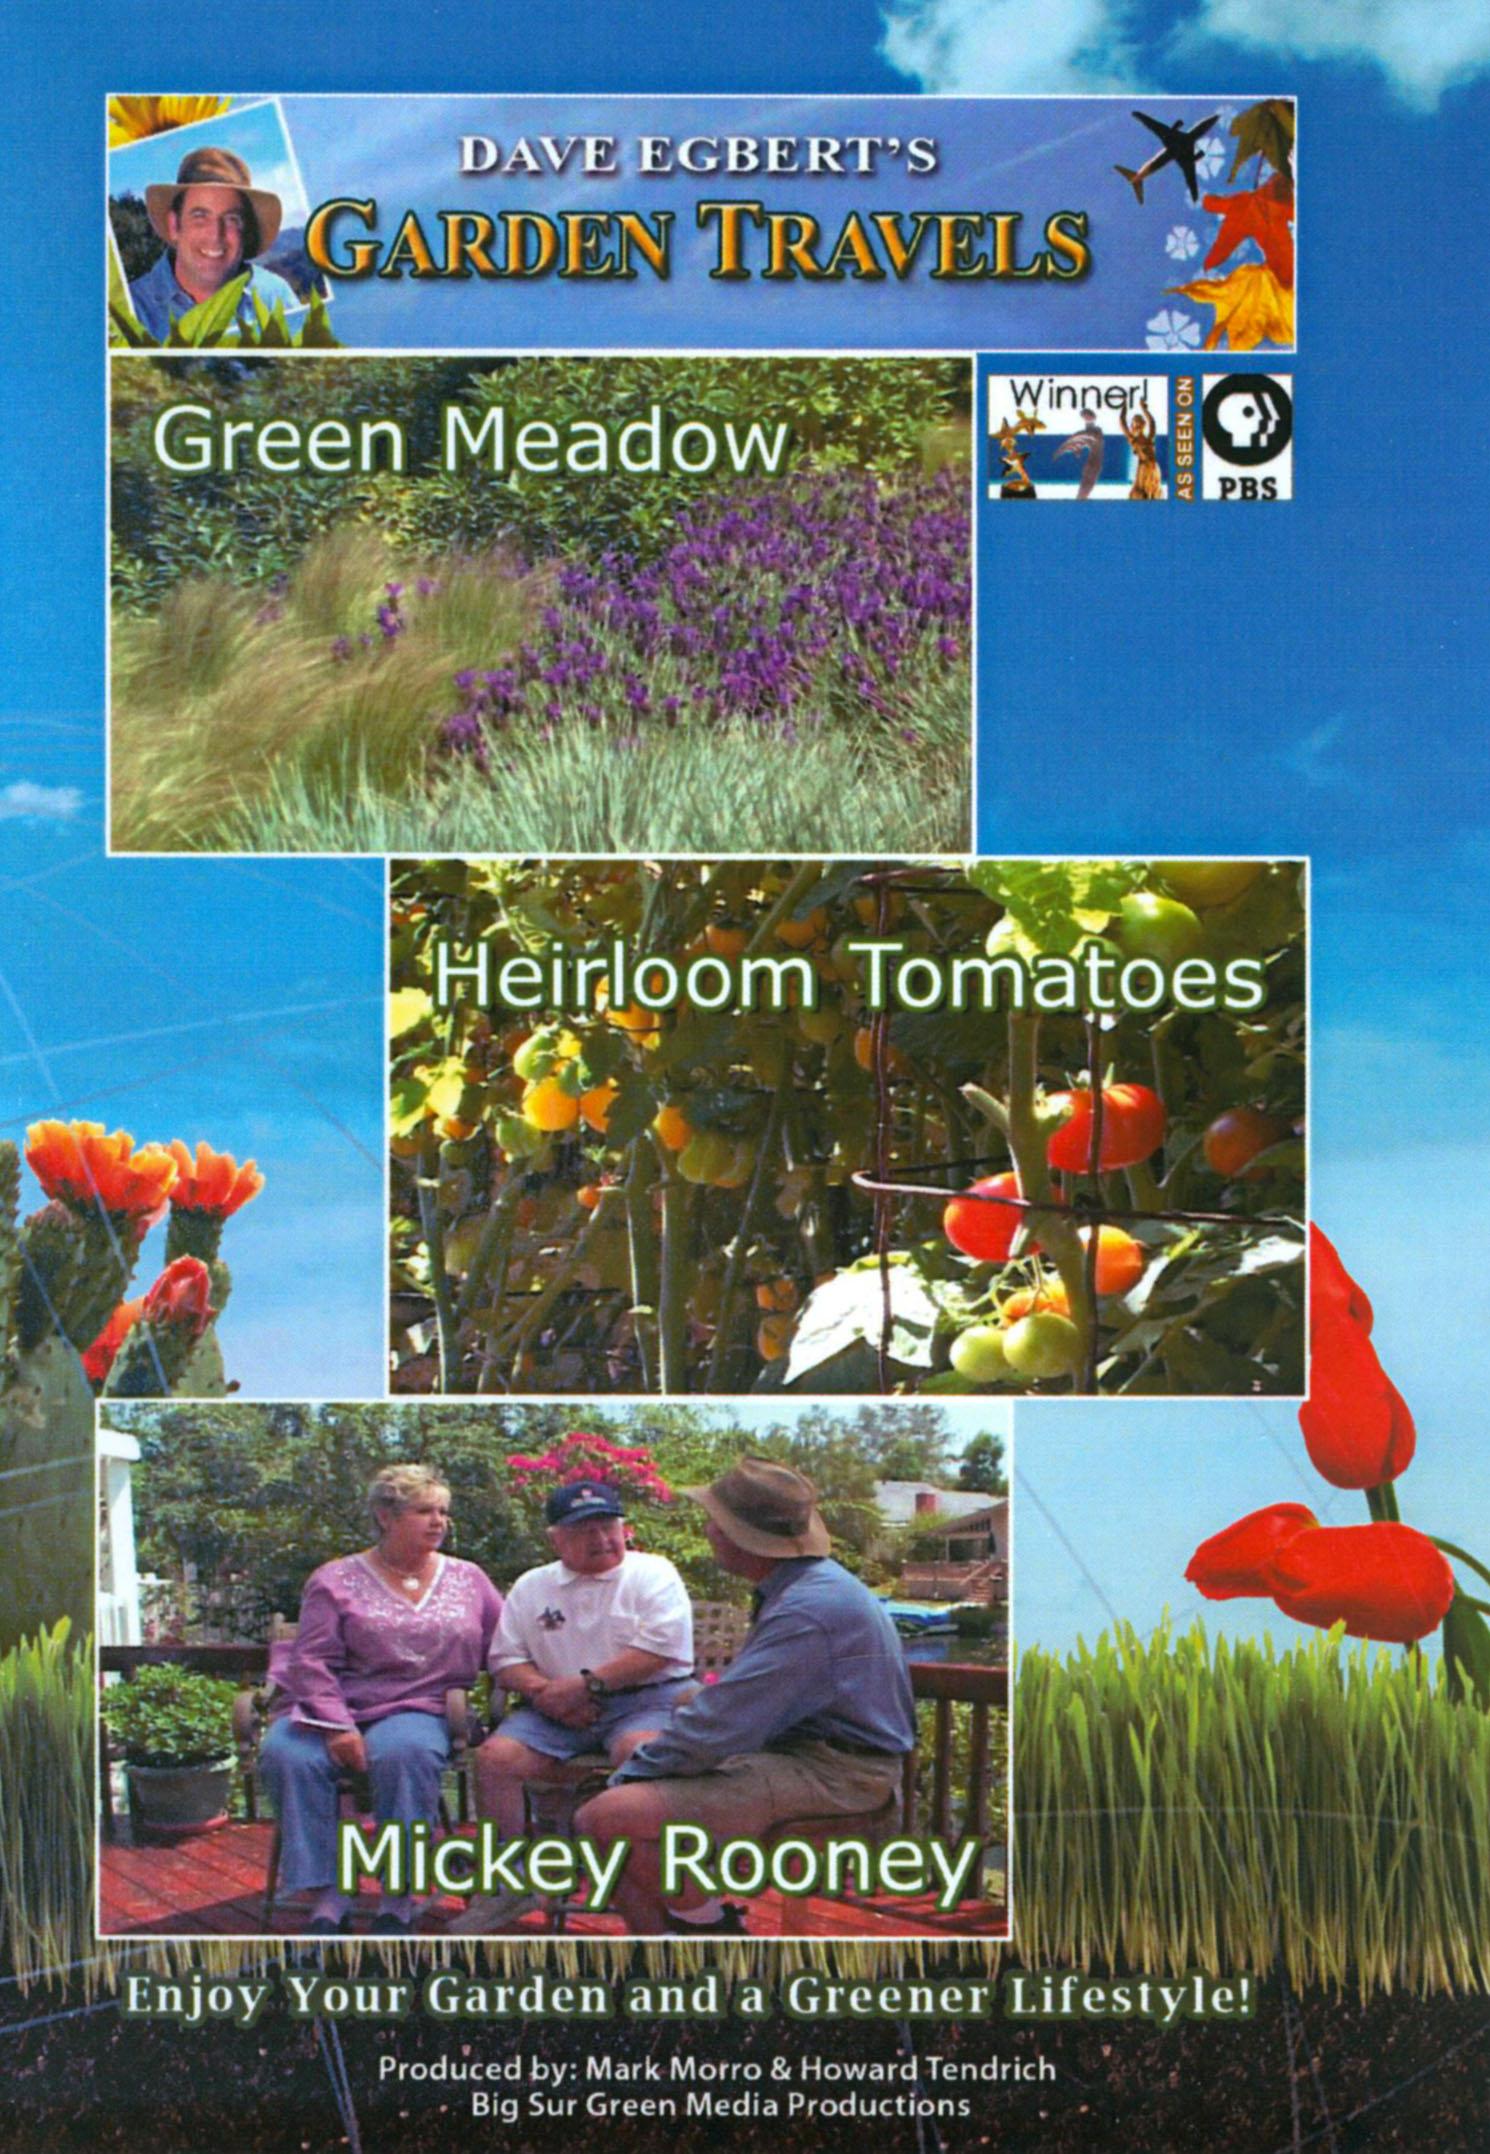 Dave Egbert's Garden Travels: Green Meadow/Heirloom tomatoes/Mickey Rooney